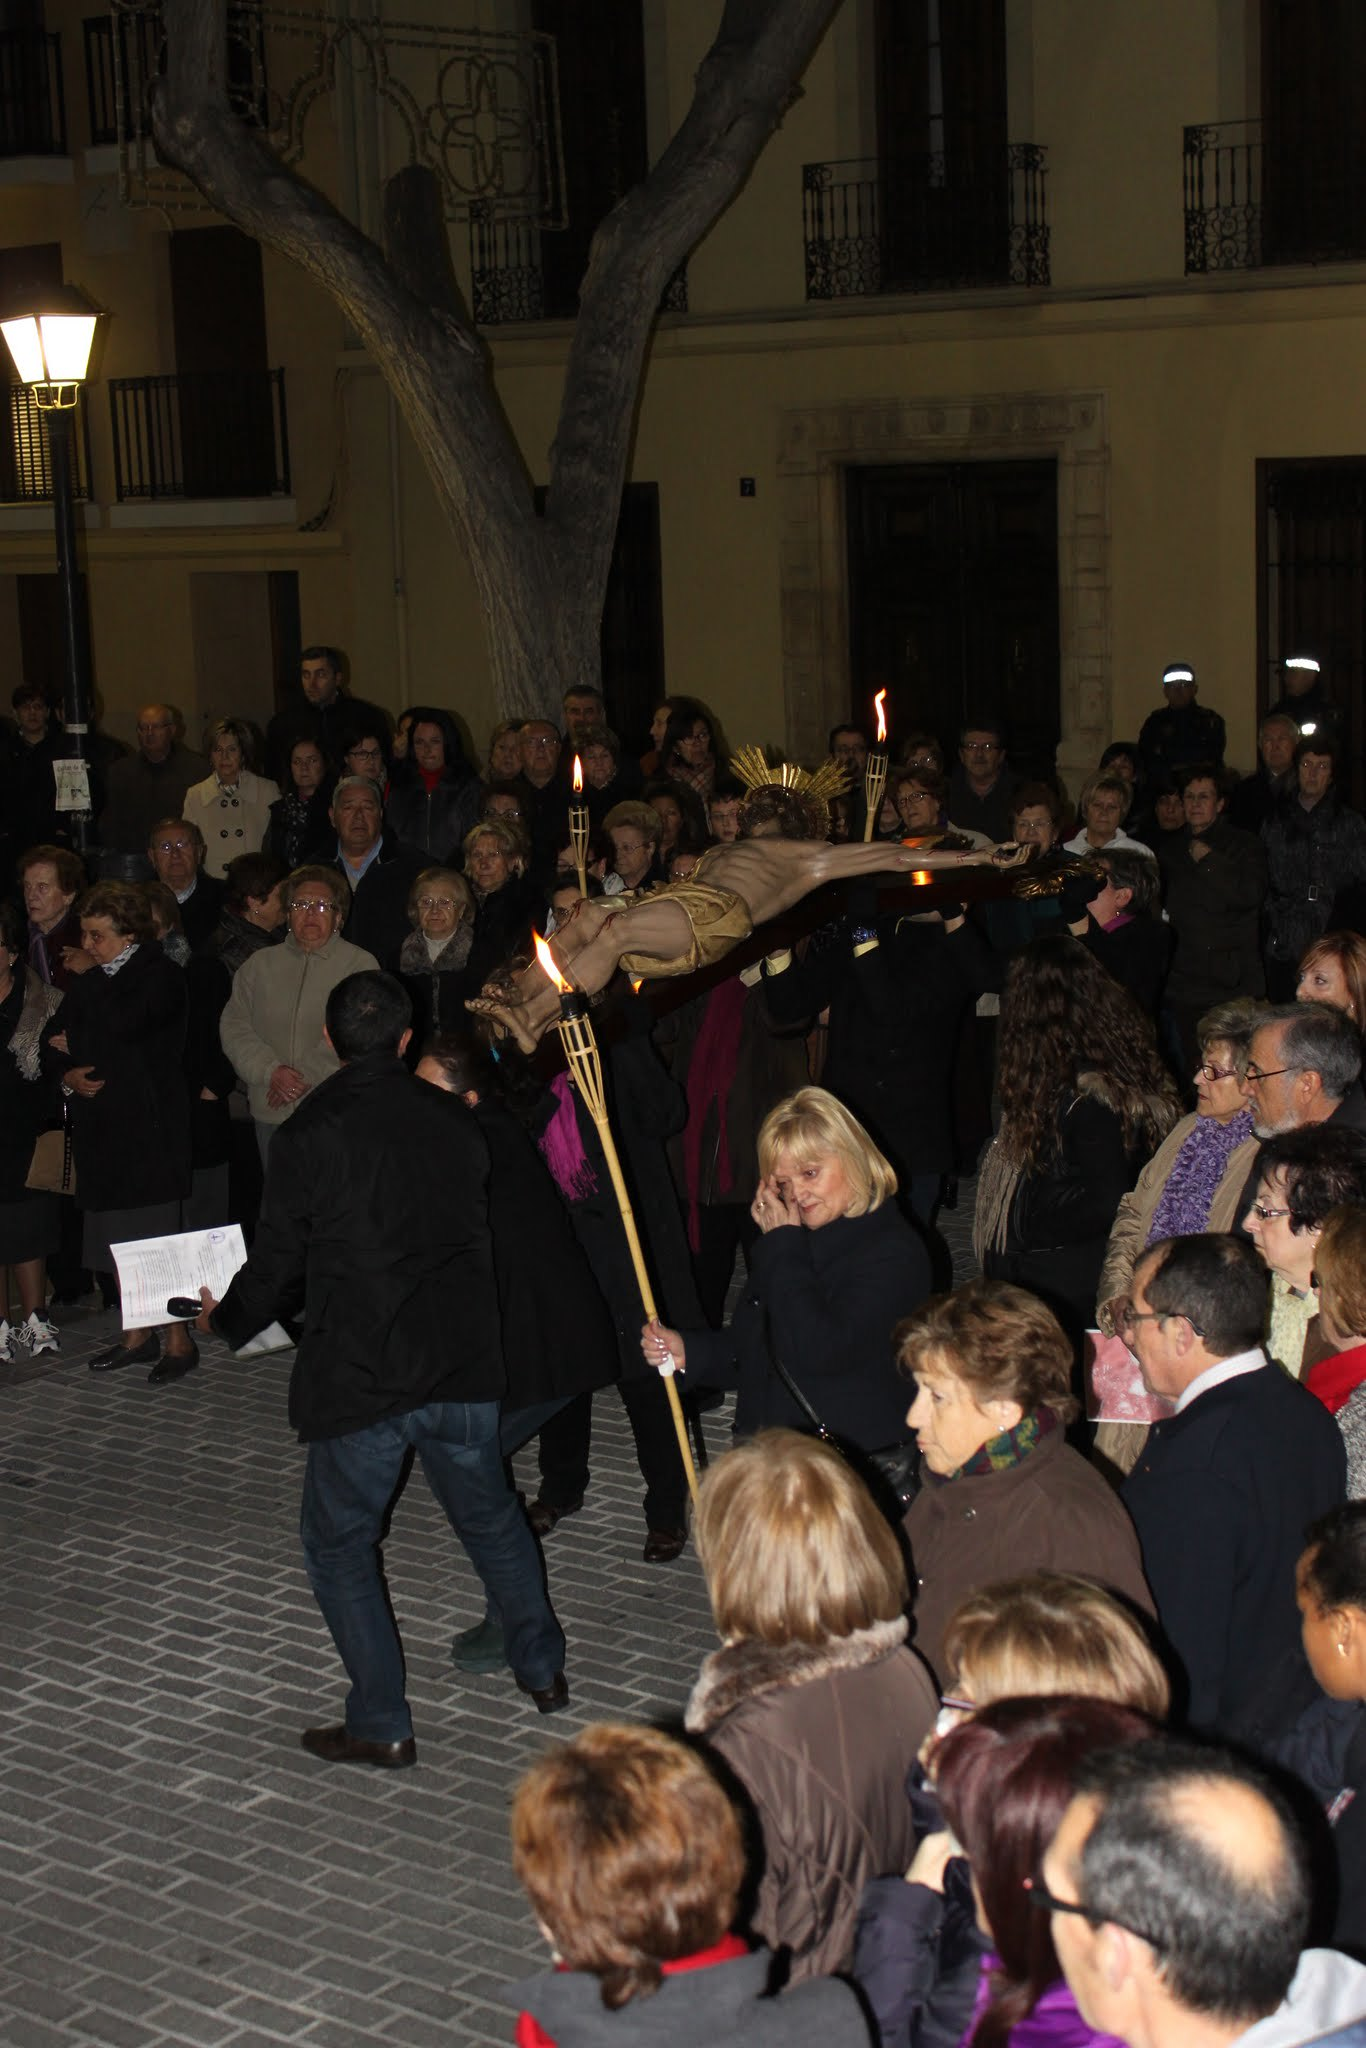 (2013-03-22) - IV Vía Crucis nocturno - Javier Romero Ripoll (123)